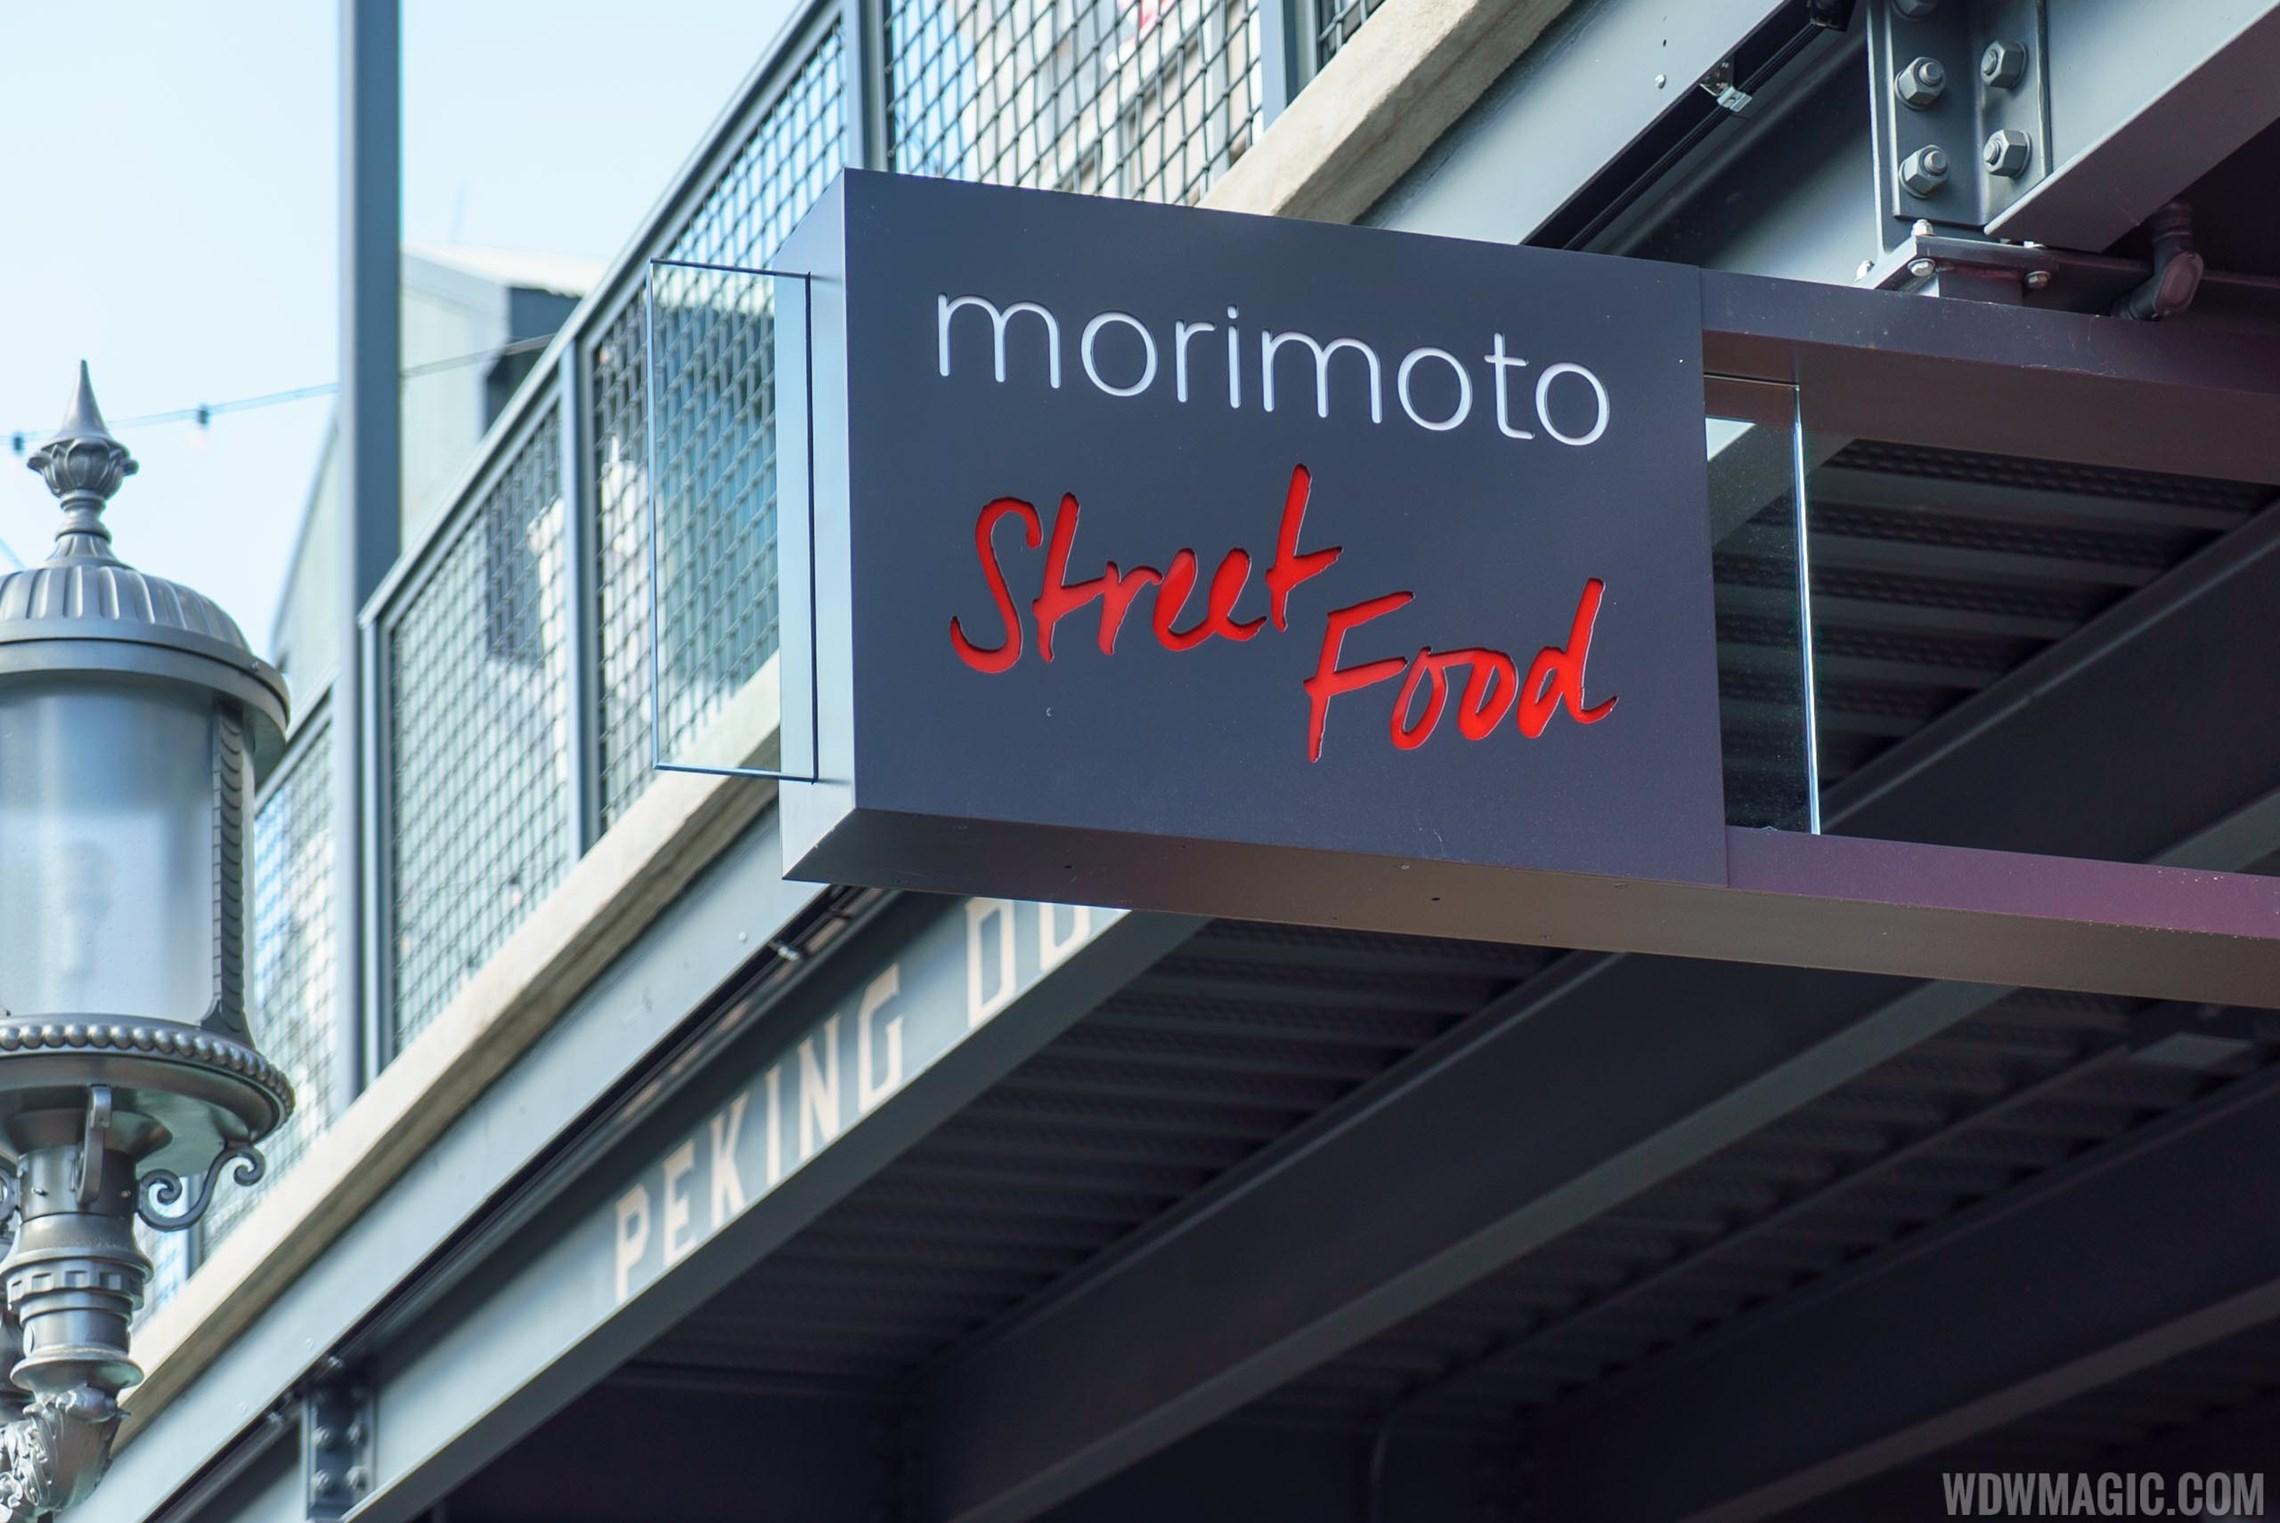 Morimoto Street Food overview